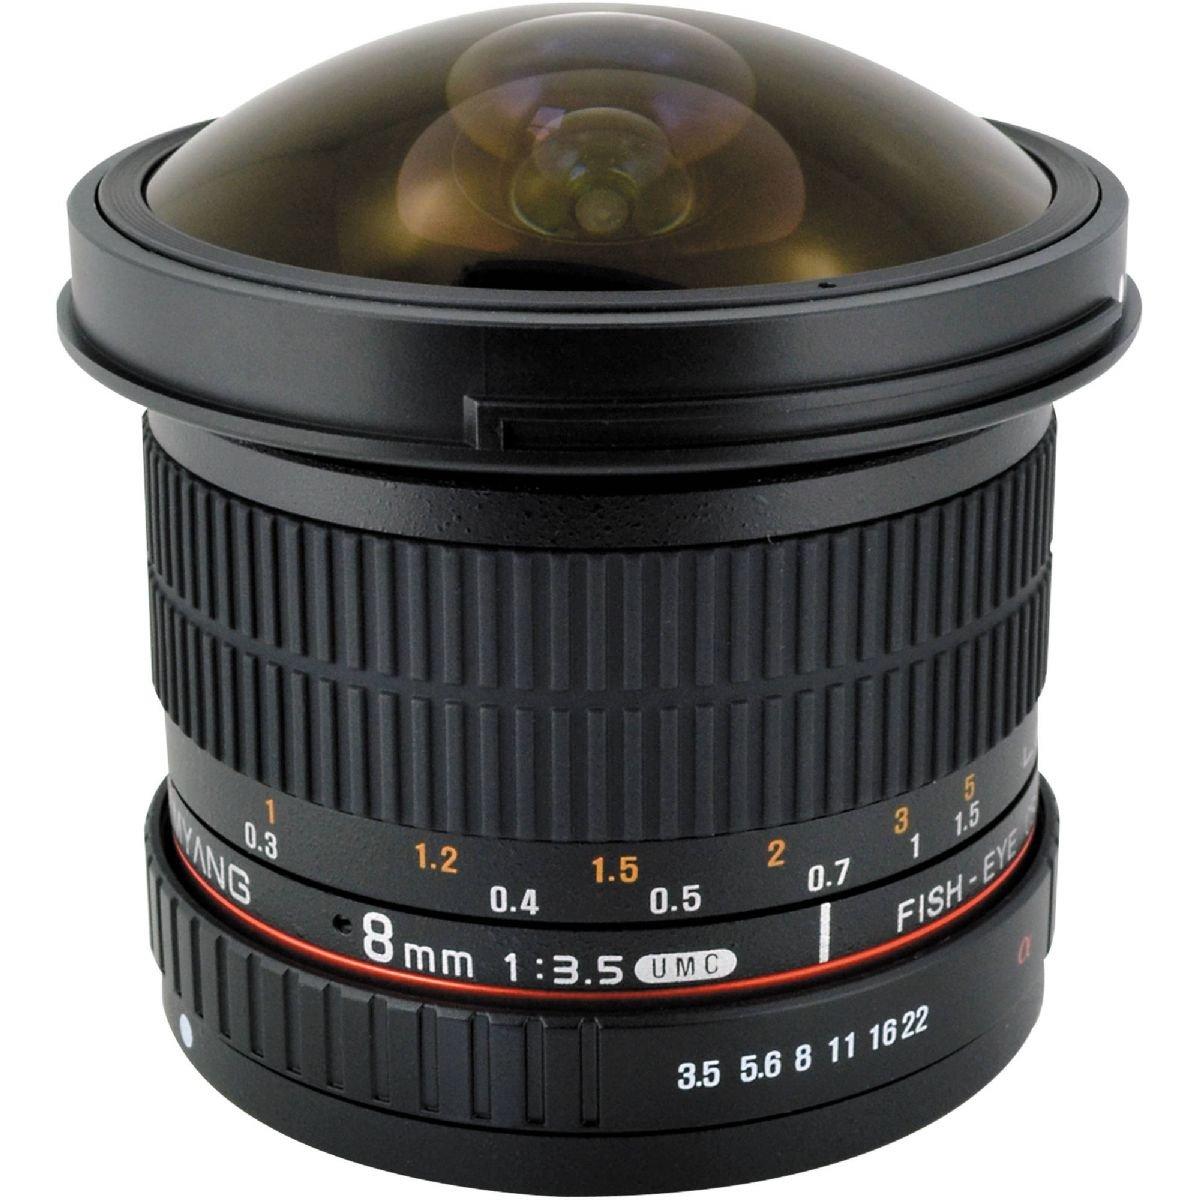 SAMYANG 8 mm f/3,5 UMC Fish-eye CS II pro Canon EOS M